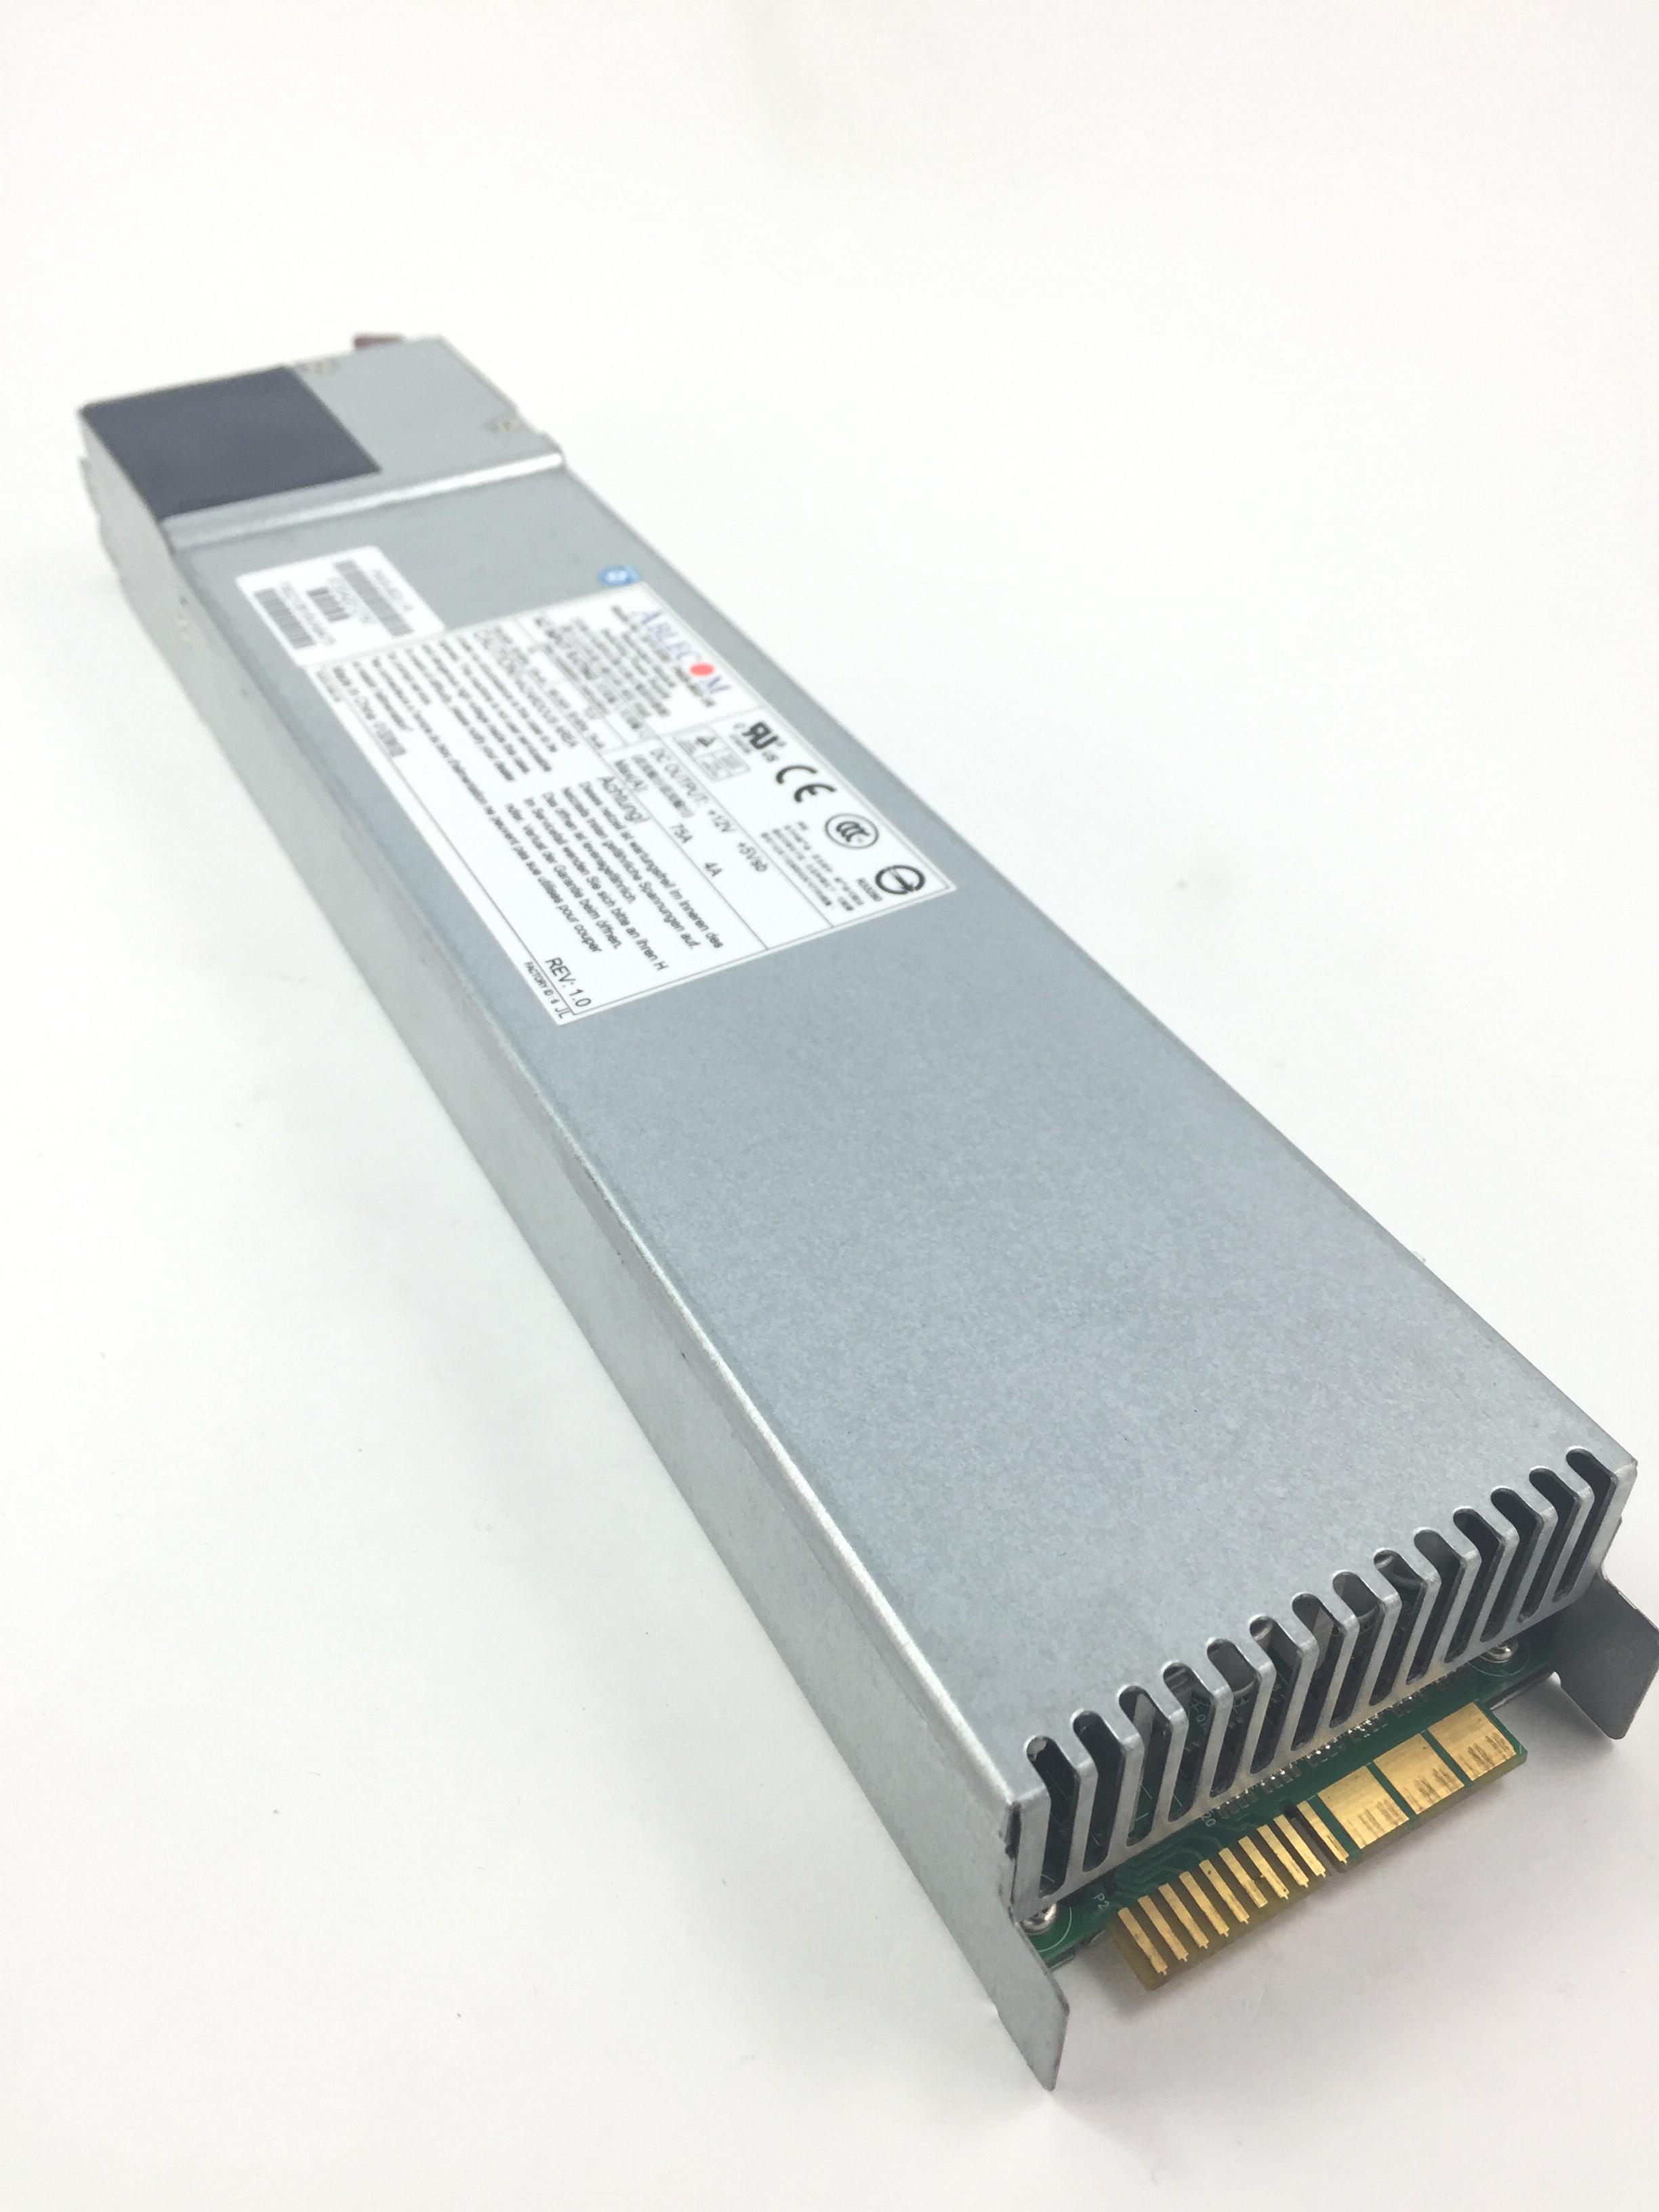 Supermicro 900W Redundant Power Supply (PWS-902-1R)